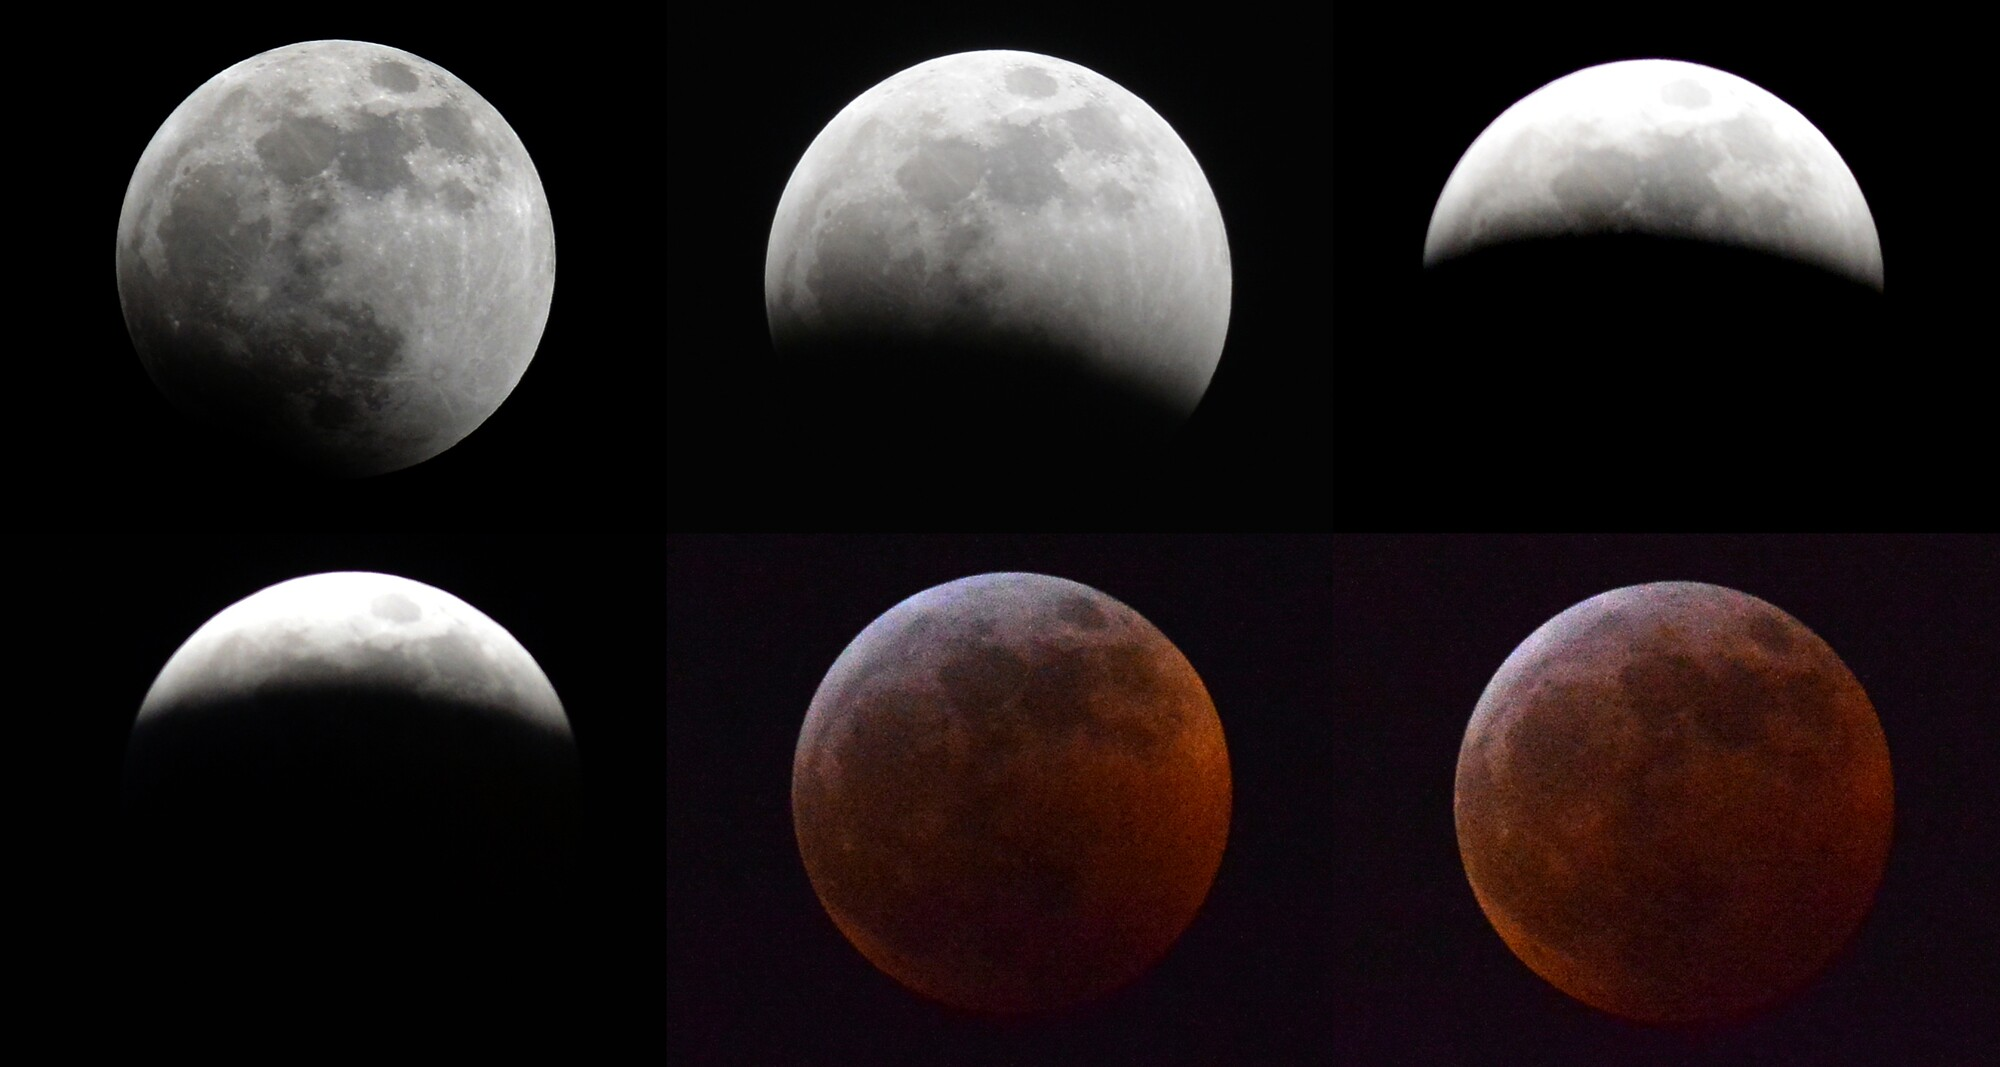 mooncomposite6.jpg